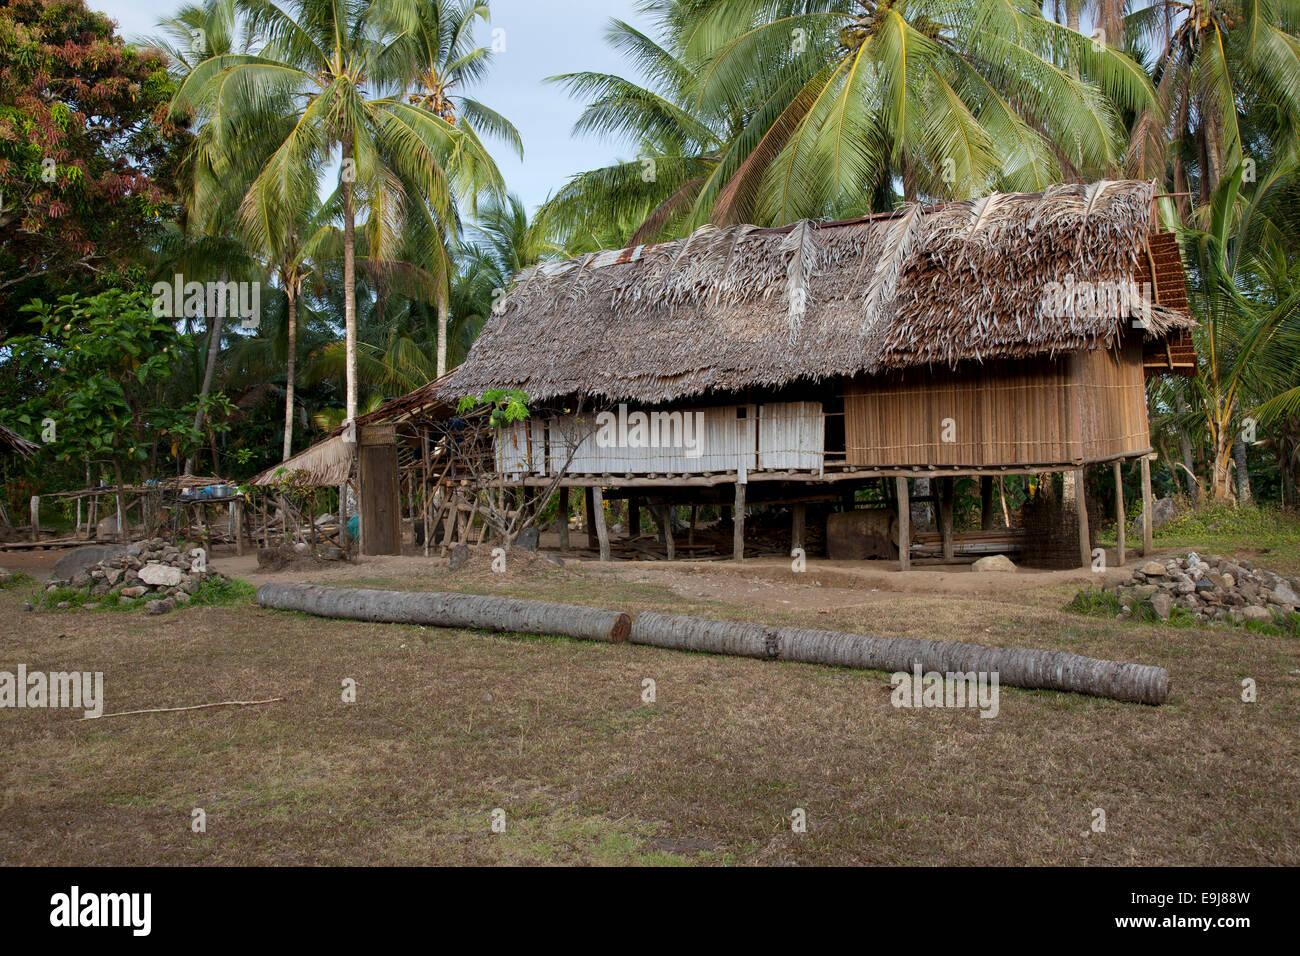 Stiled Houses in Yaugiwa Village, Northeastern Papua New Guinea Stock Photo